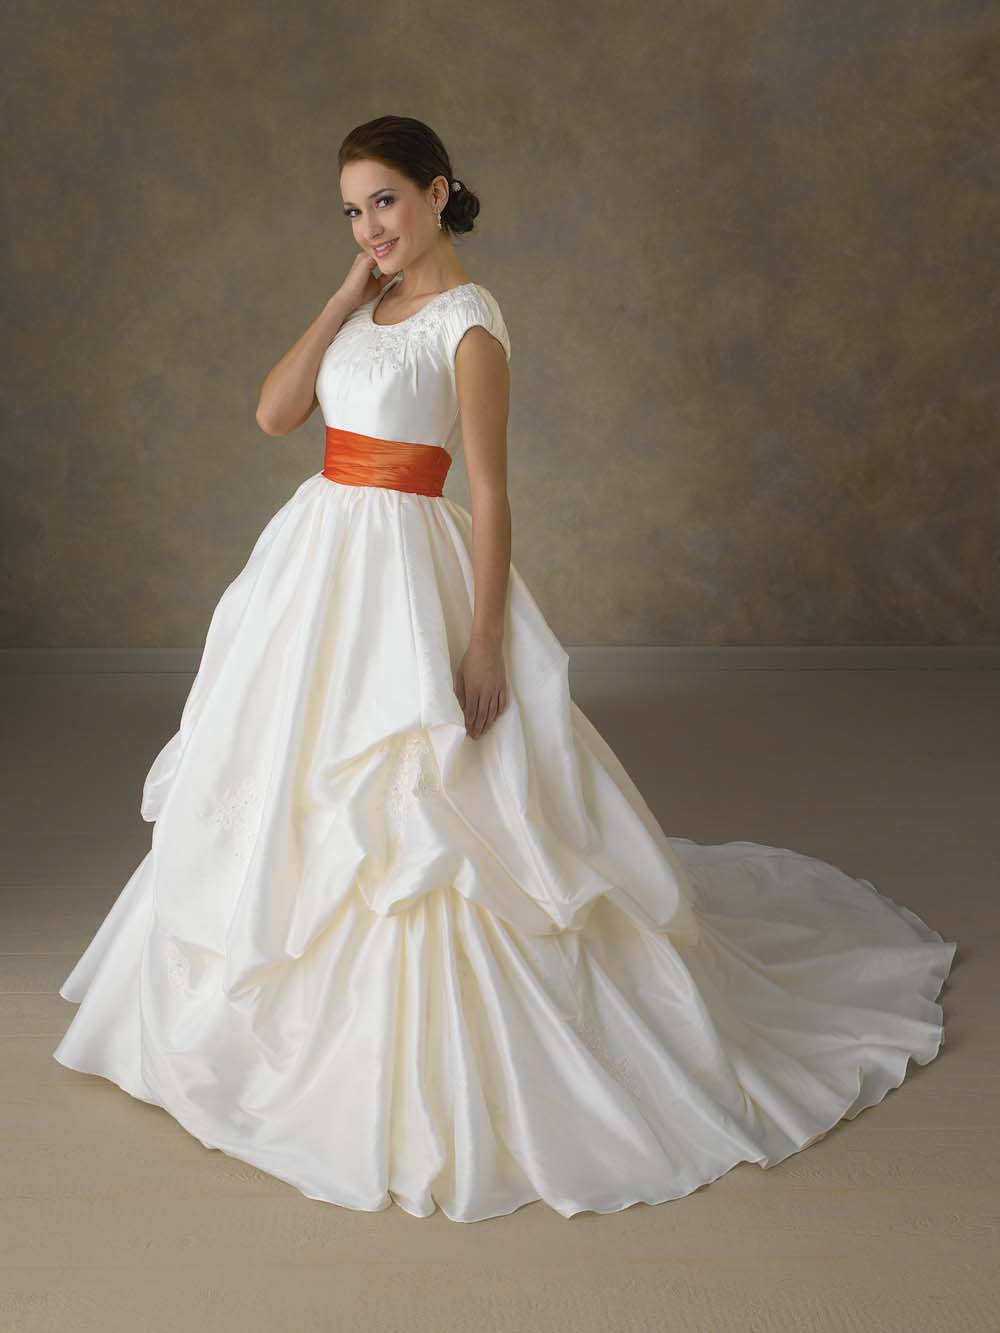 Wedding Gown Giveaway On Bonnys Blog